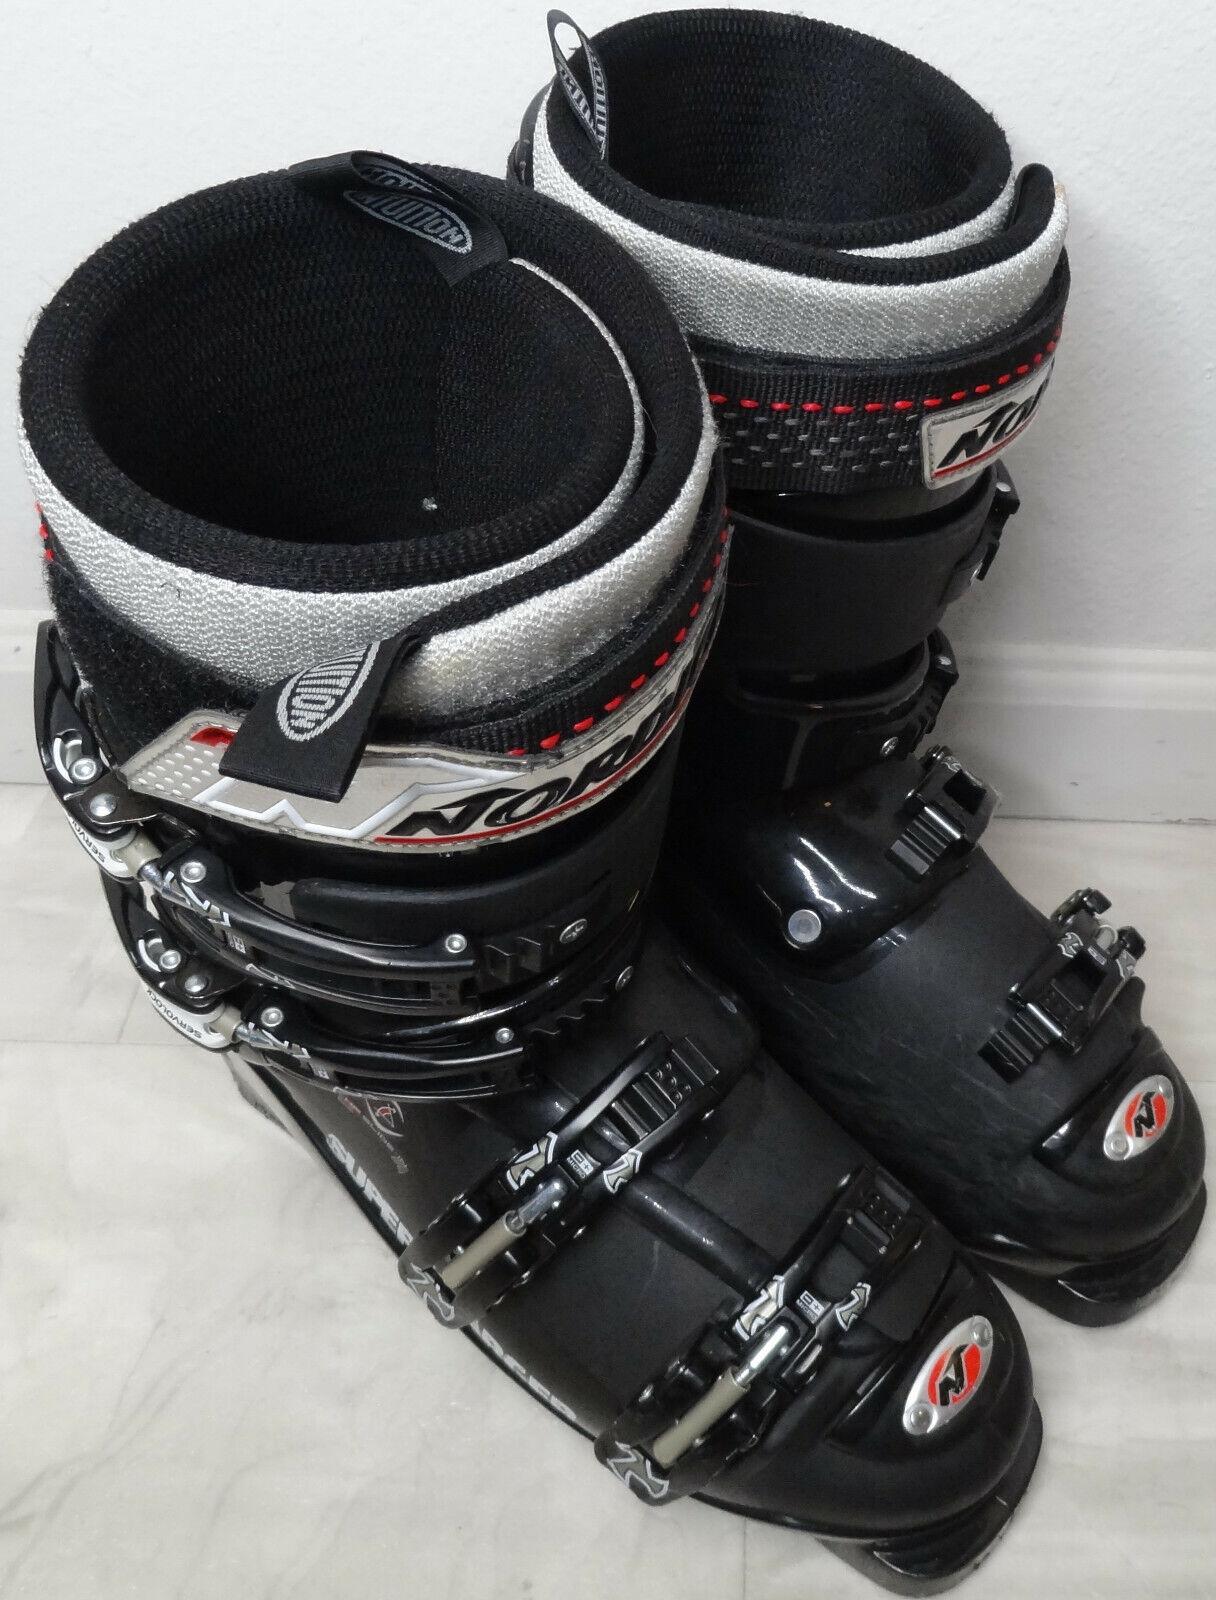 Nordica Super Charger Flash Ski Stiefel Mondo Größe 27.5 US Mens 9.5 US damen 10.5